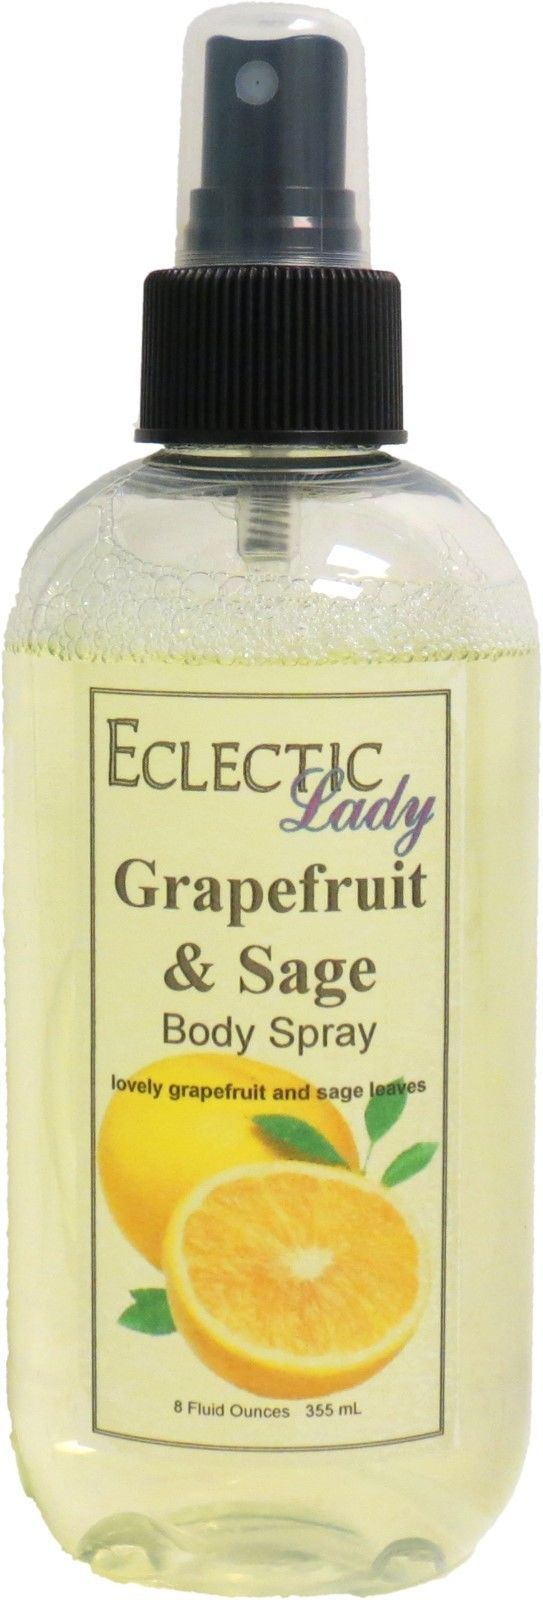 Grapefruit And Sage Body Spray